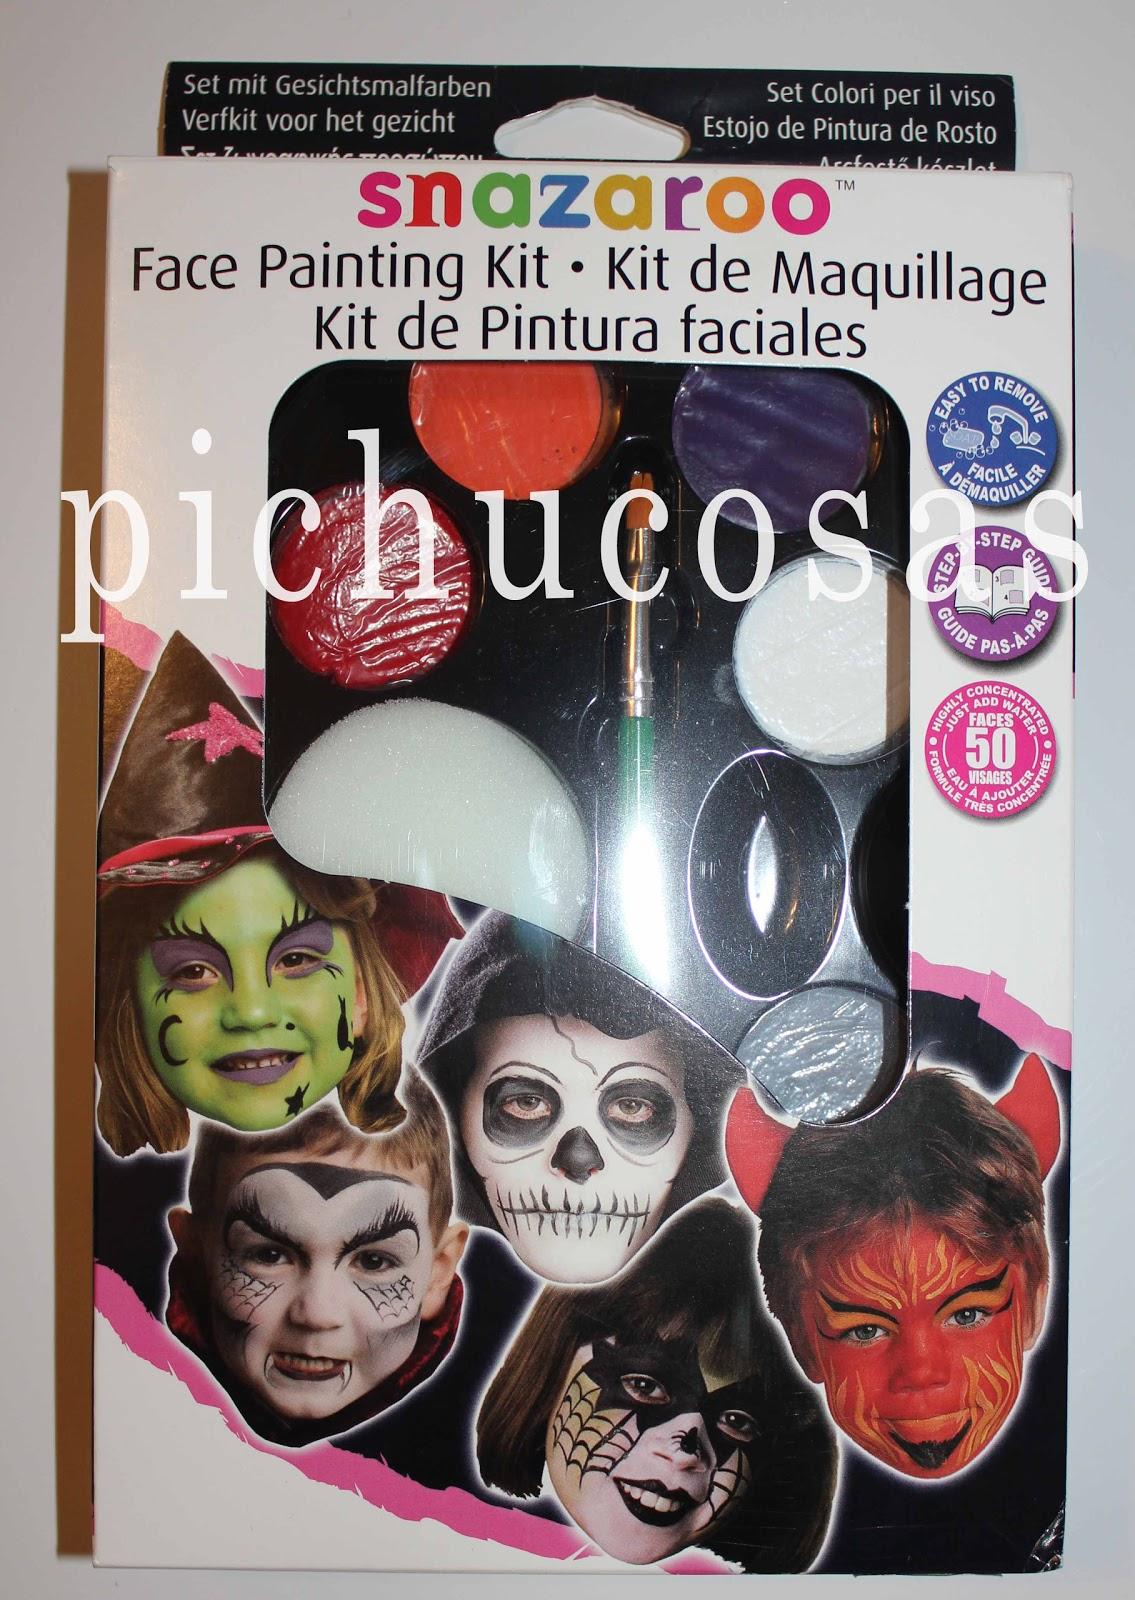 Pichucosas kit de pinturas faciales especial halloween - Pinturas para halloween ...